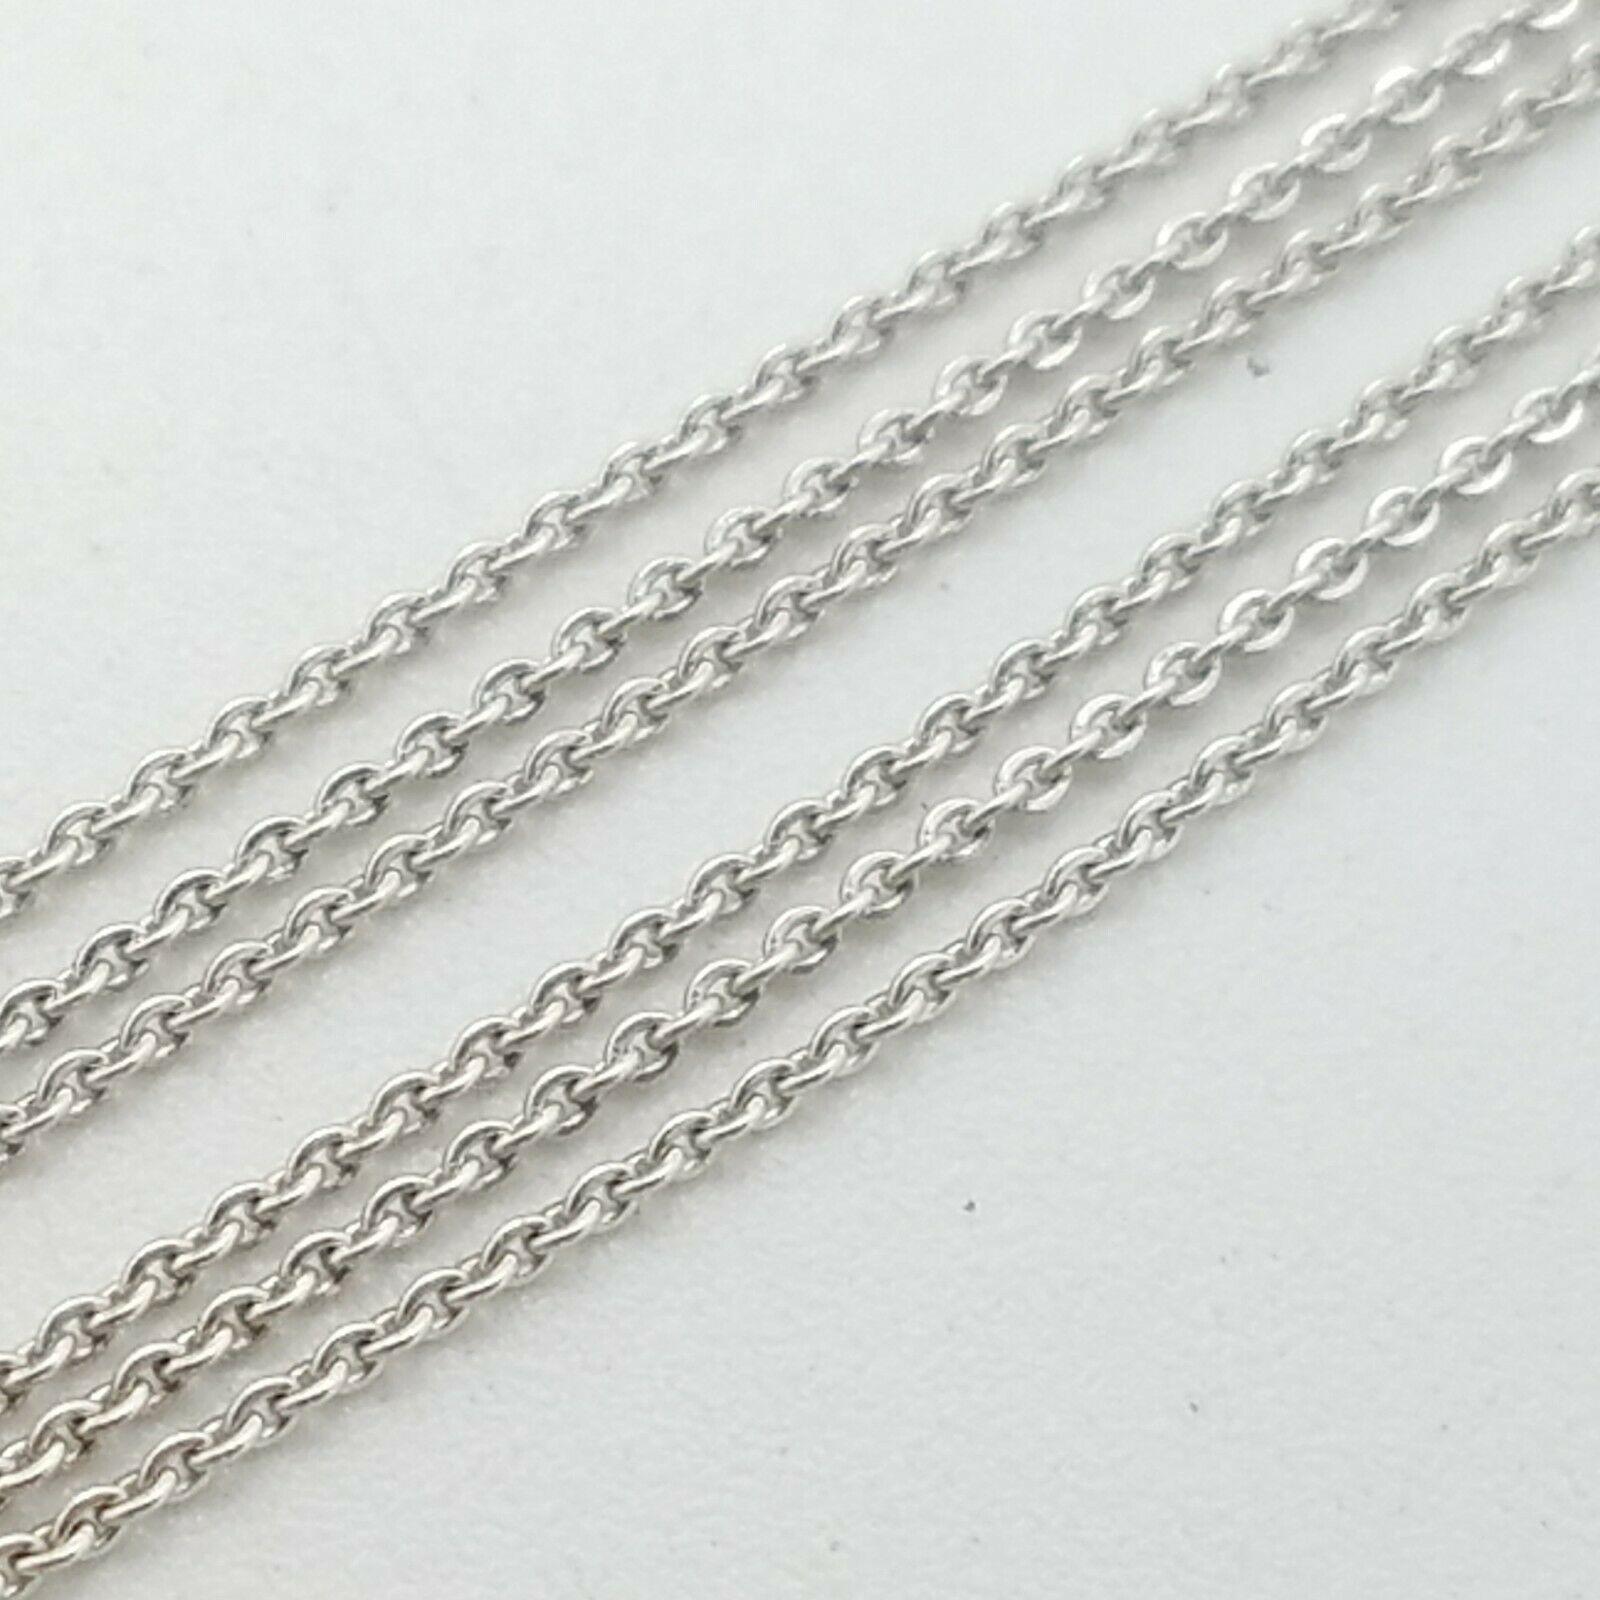 Rci White Gold 14k Thin Classic Link Chain Necklace 16 Inch Turkey White Gold Necklace Ideas Of White Gold Necklace Whiteg